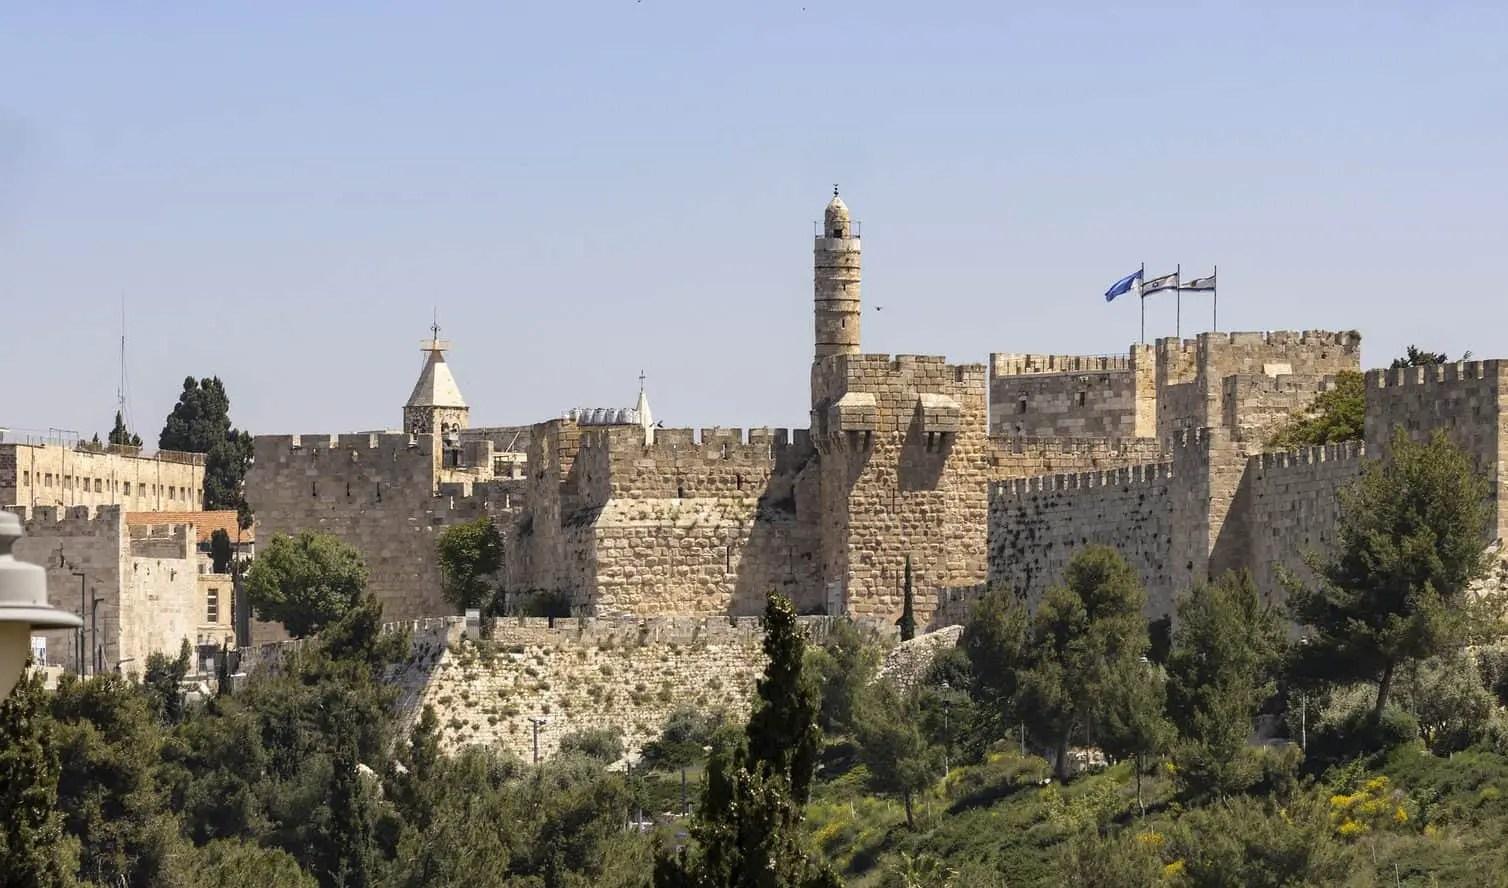 Top 10 sites in Jerusalem, Israel